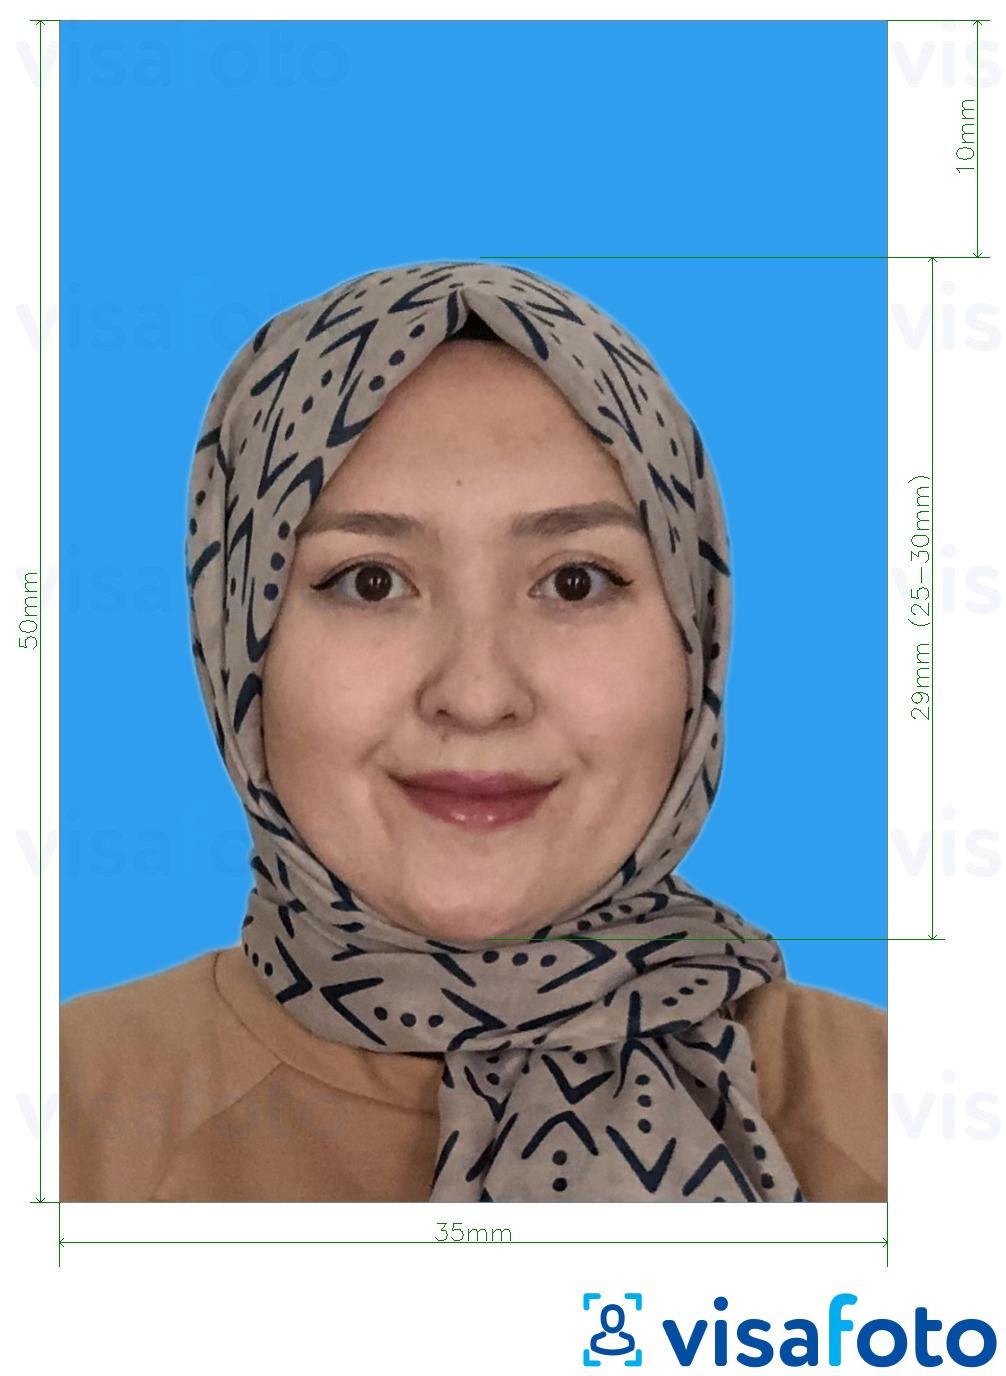 Foto Paspor Malaysia Persyaratan Latar Belakang Dan Alat 35x50 Mm Biru